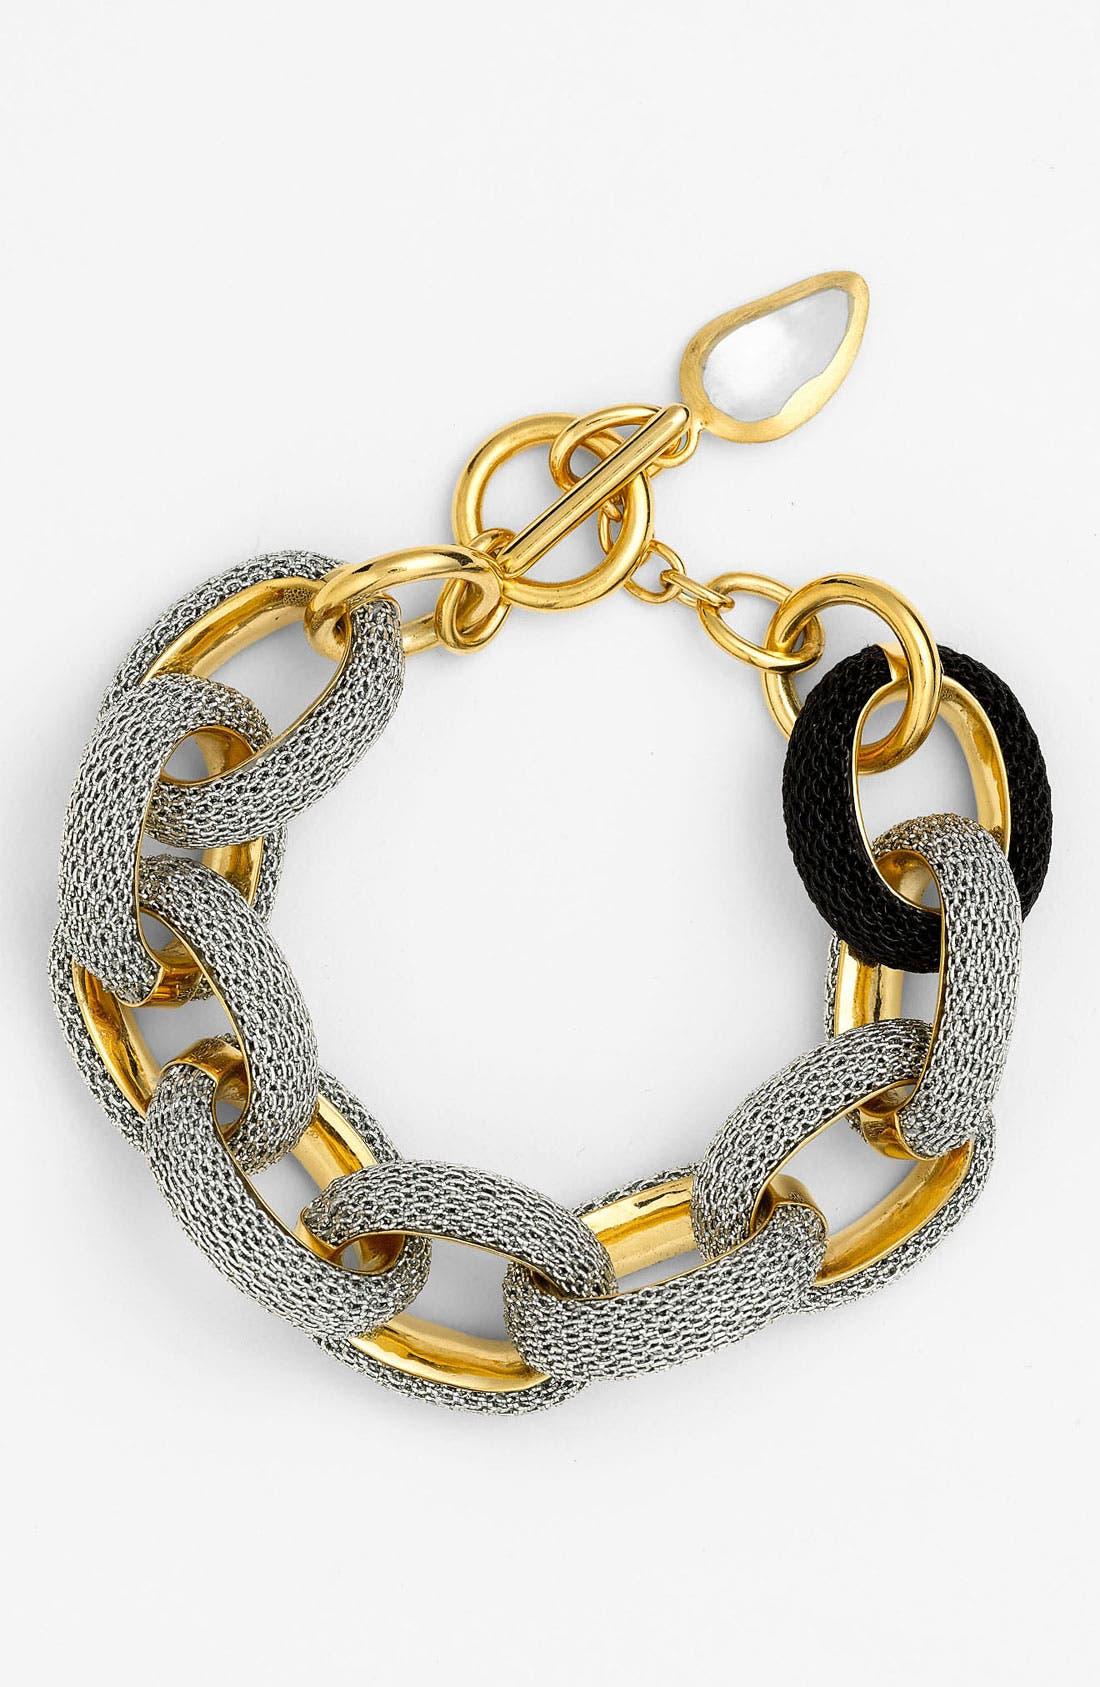 Main Image - Adami & Martucci 'Mesh' Link Bracelet (Nordstrom Exclusive)